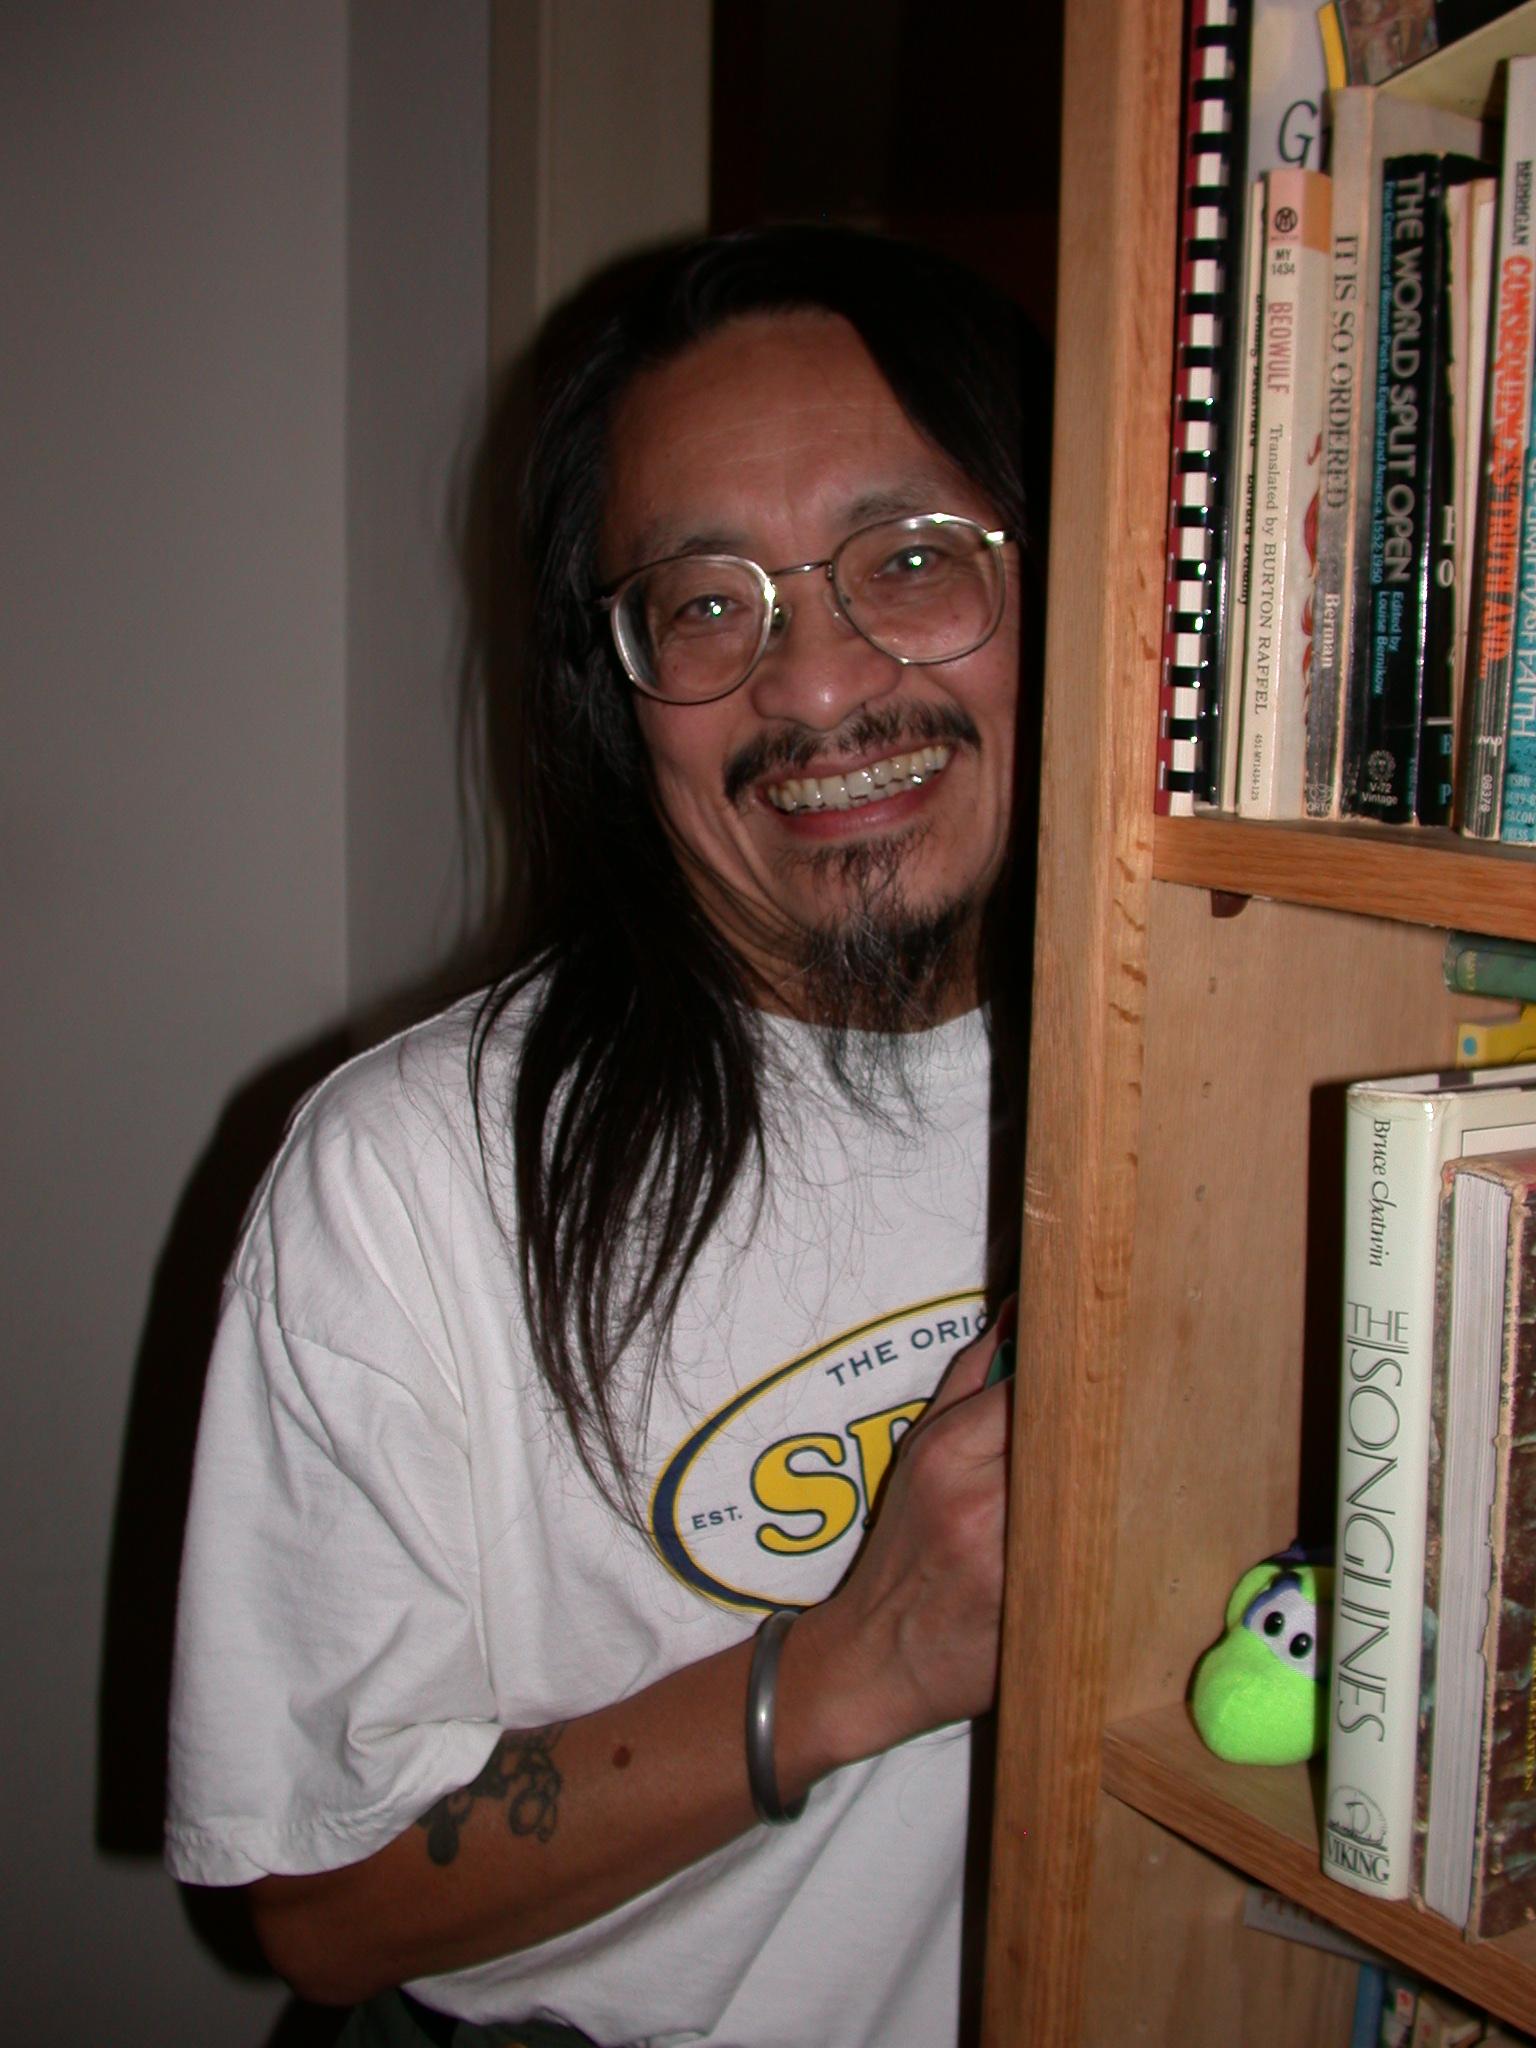 Loren Coy Behind Bookshelf